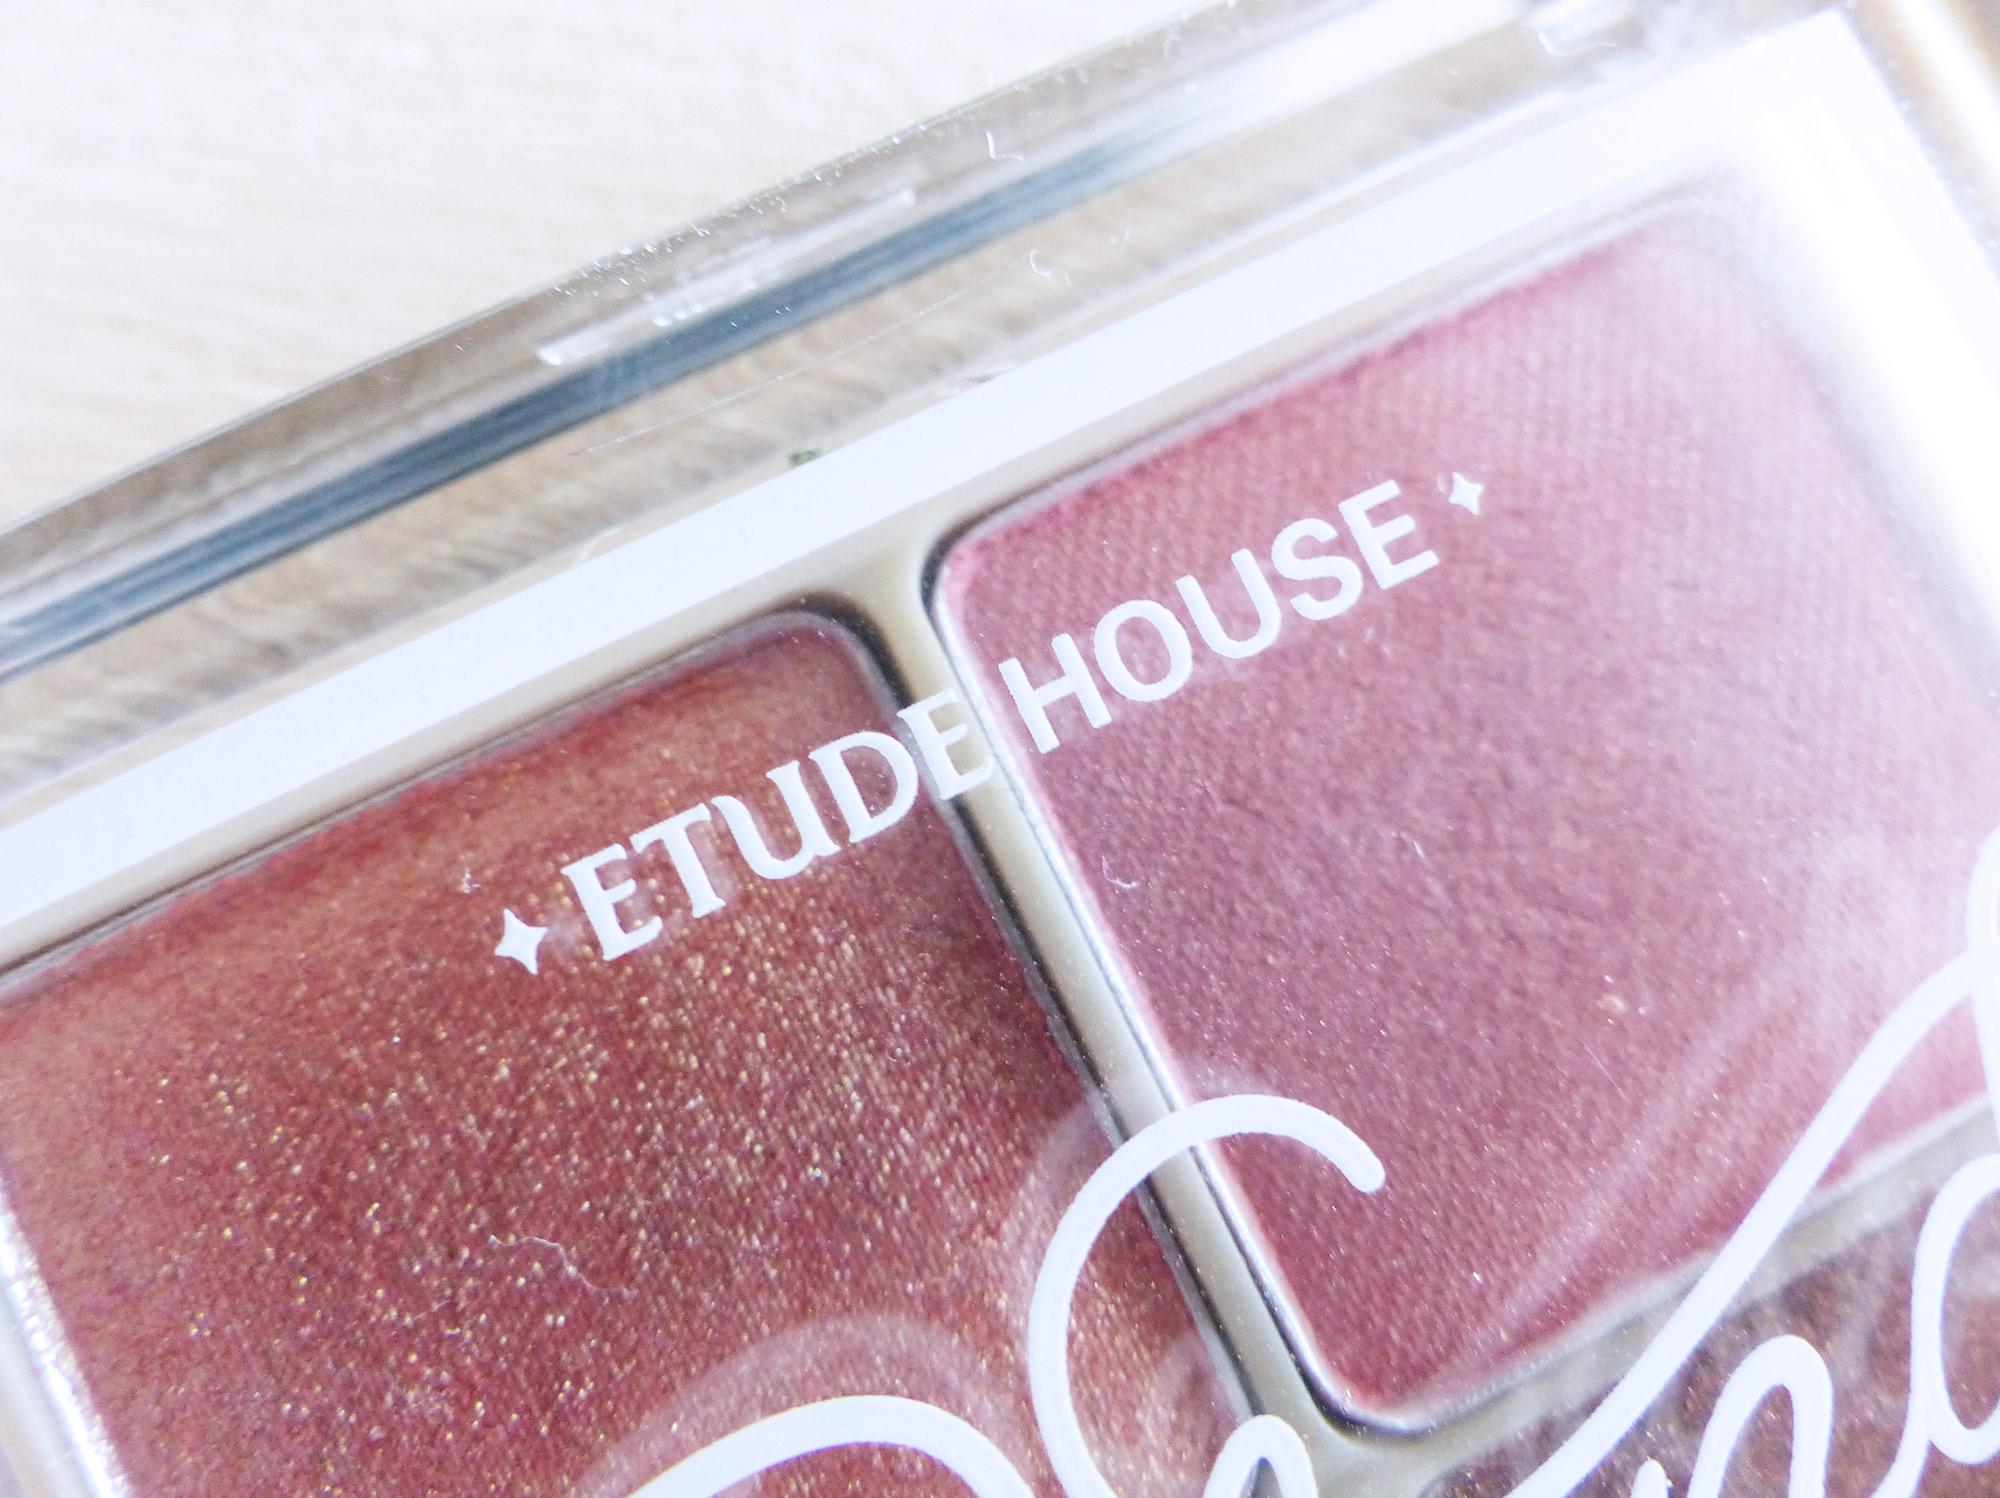 Autour de marine - Etude House Blend for Eyes 8G